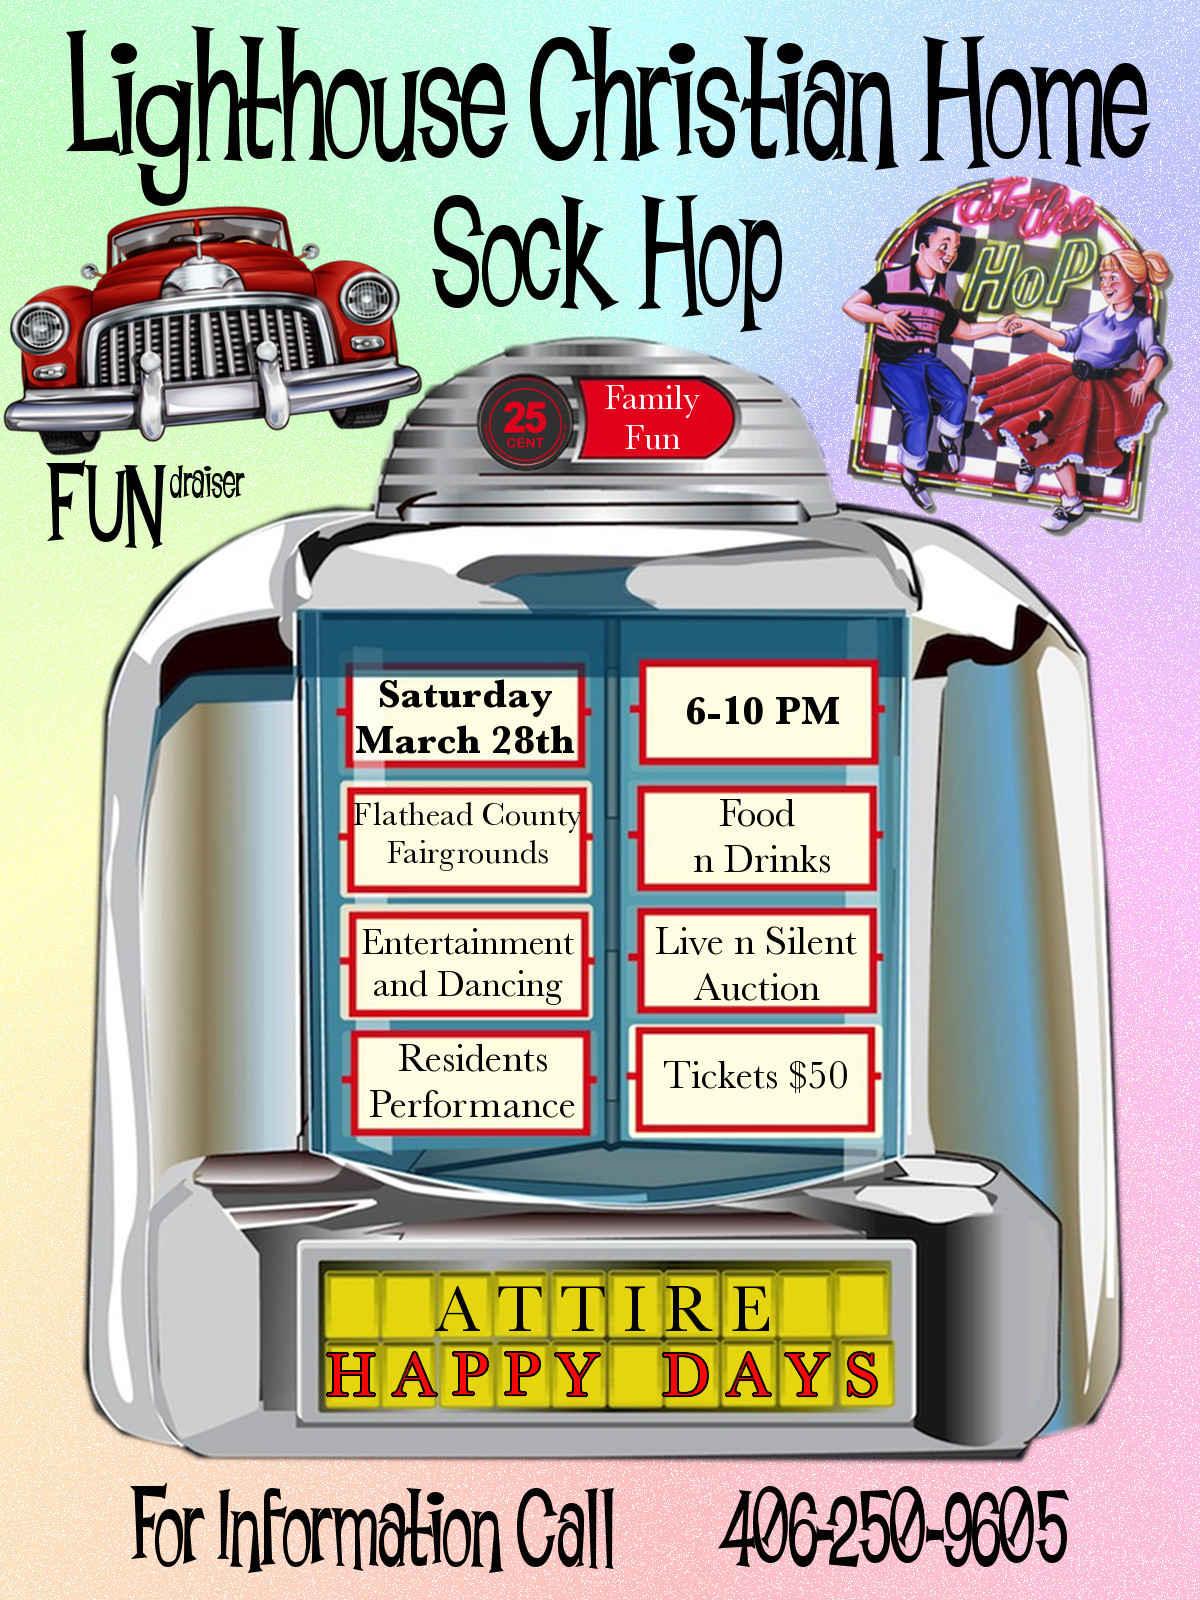 Sock Hop 2020 image